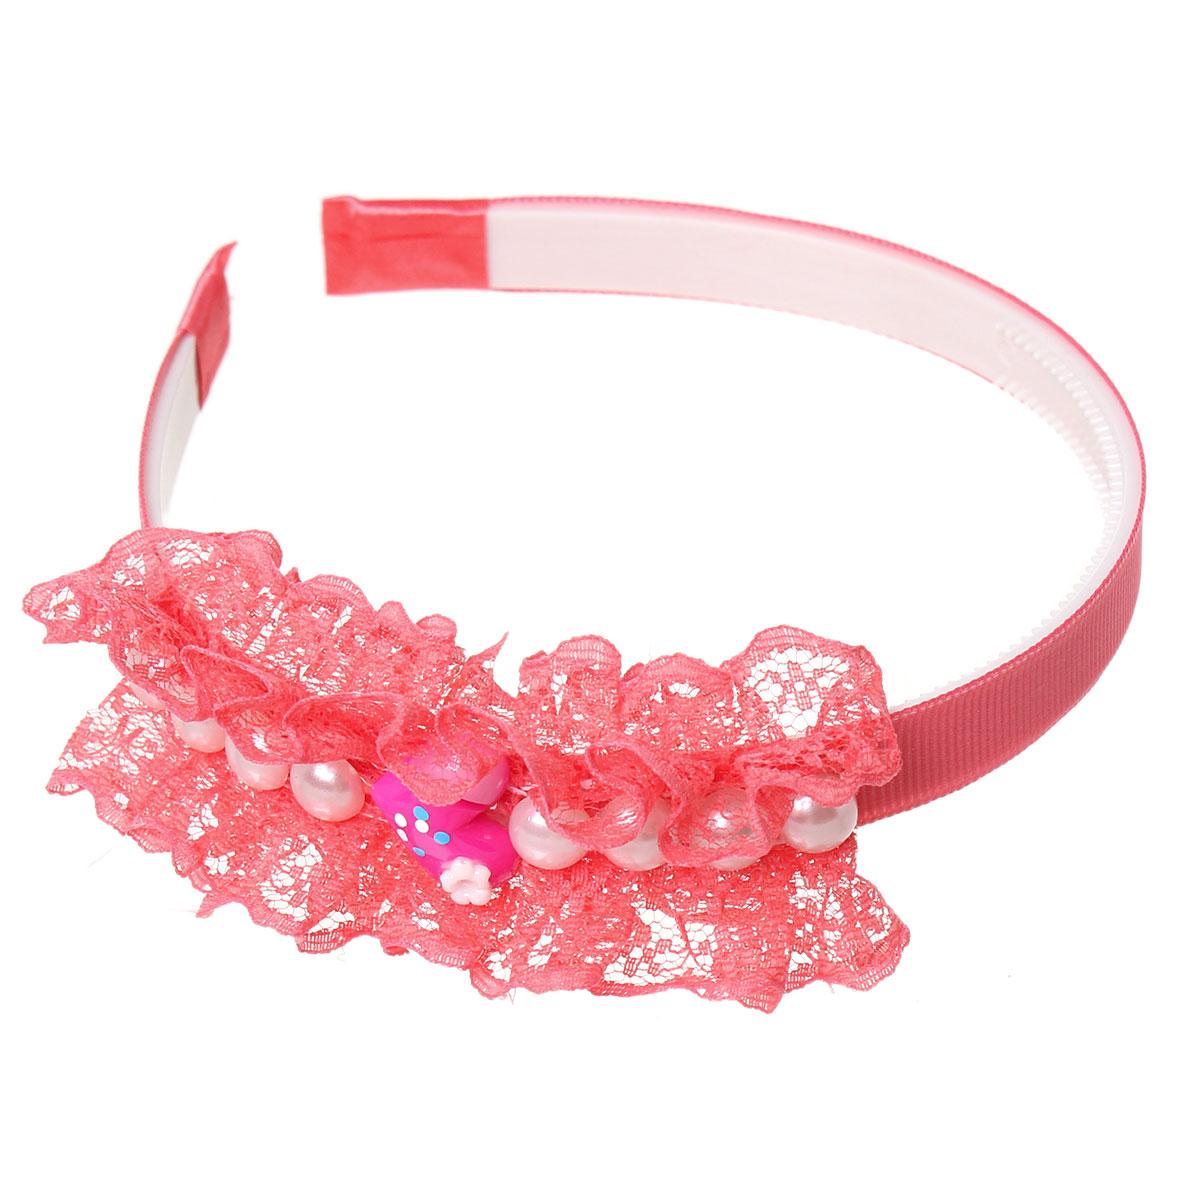 "Acrylic Headband Heart Watermelon Red Flower With White Pearl Imitation 37.2cm(14 5/8"")x 12mm(4/8""),3 PCs 2015 new(China (Mainland))"